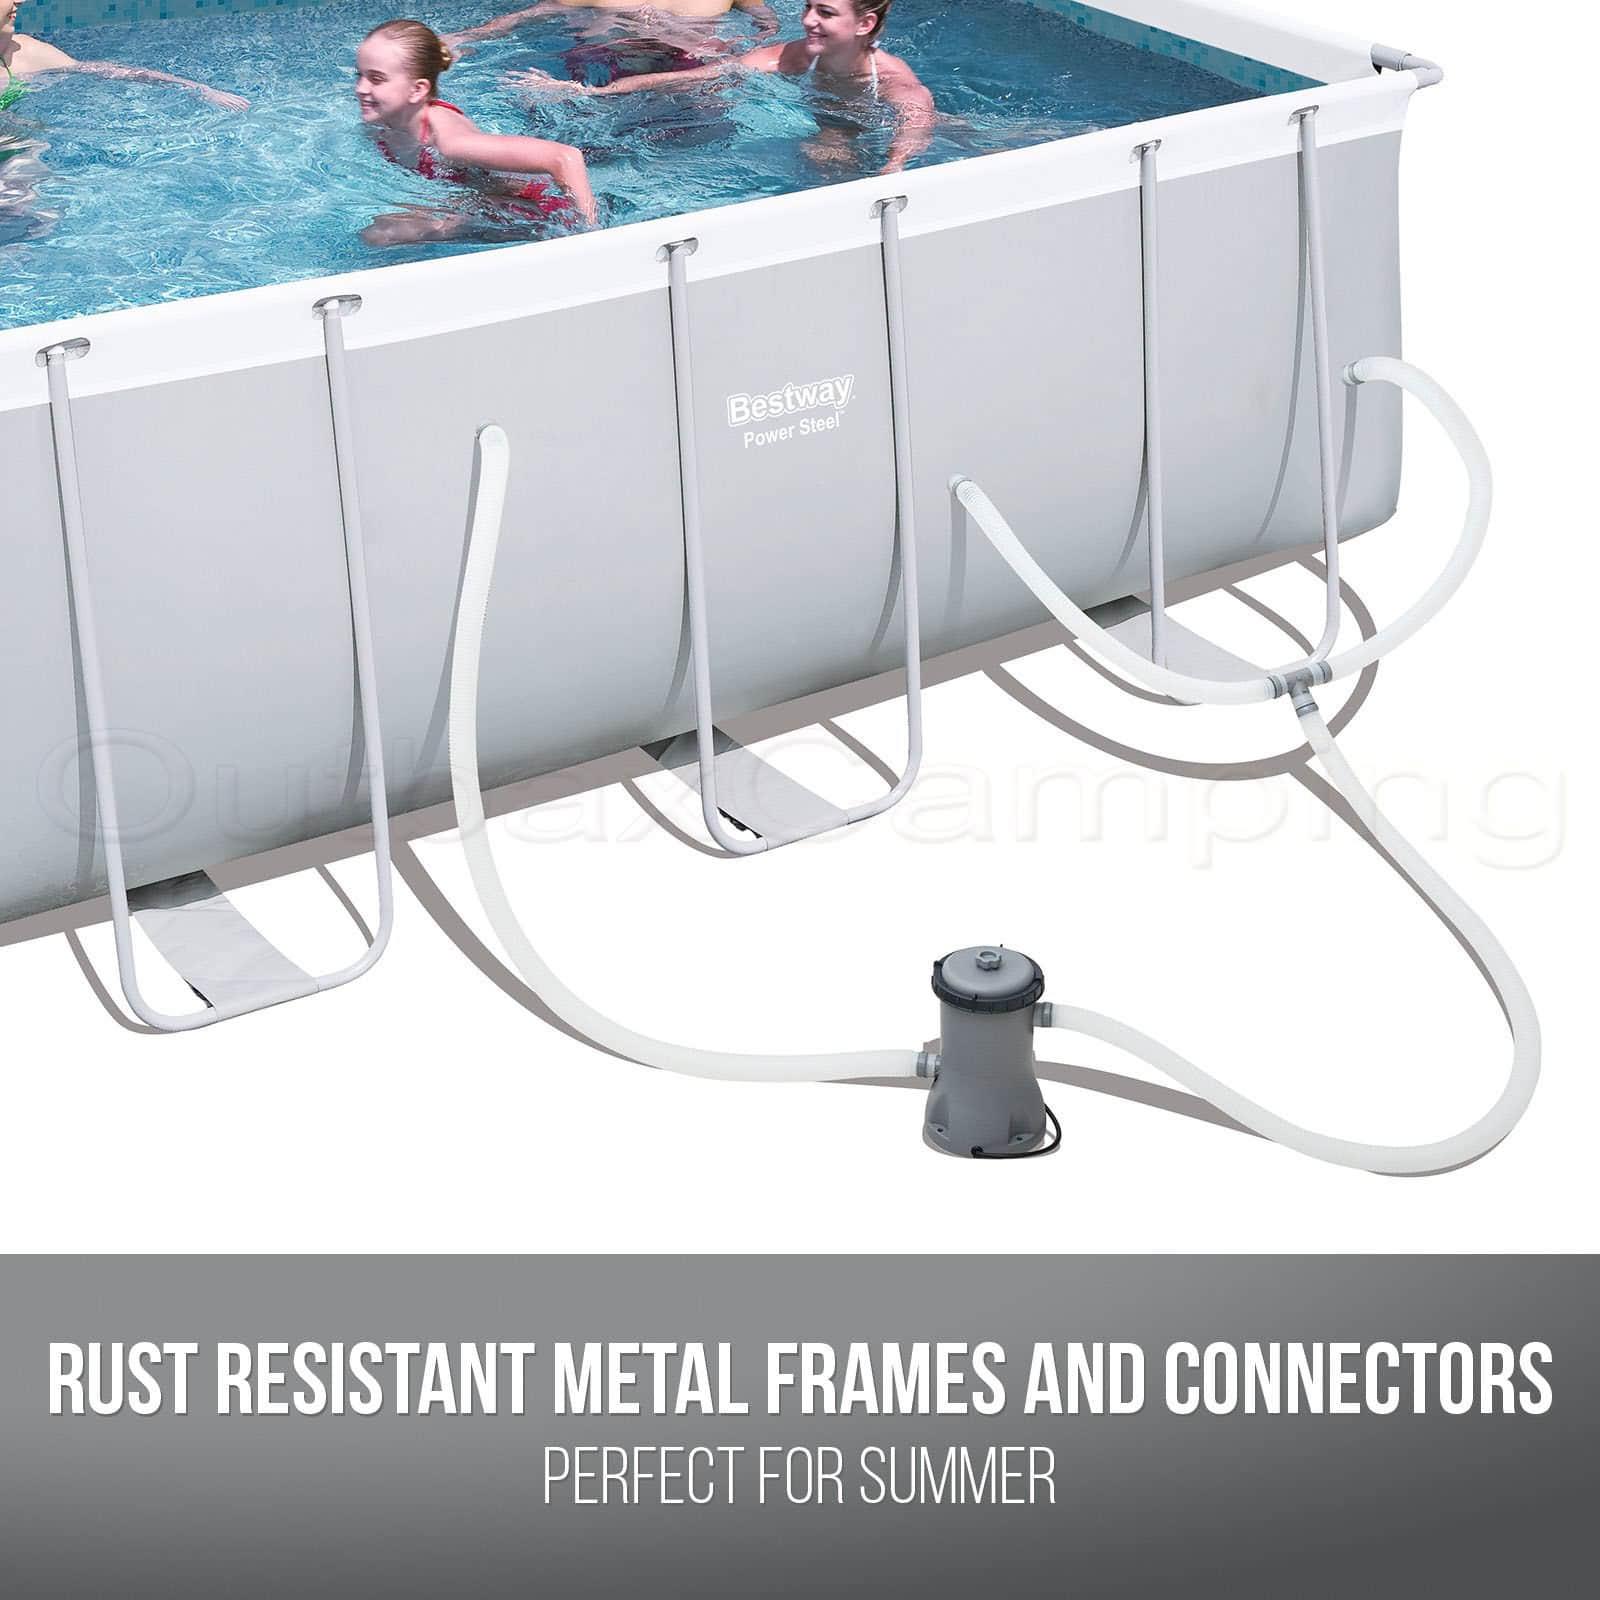 BESTWAY ABOVE GROUND Swimming Pool Power Steel Rectangular Frame ...